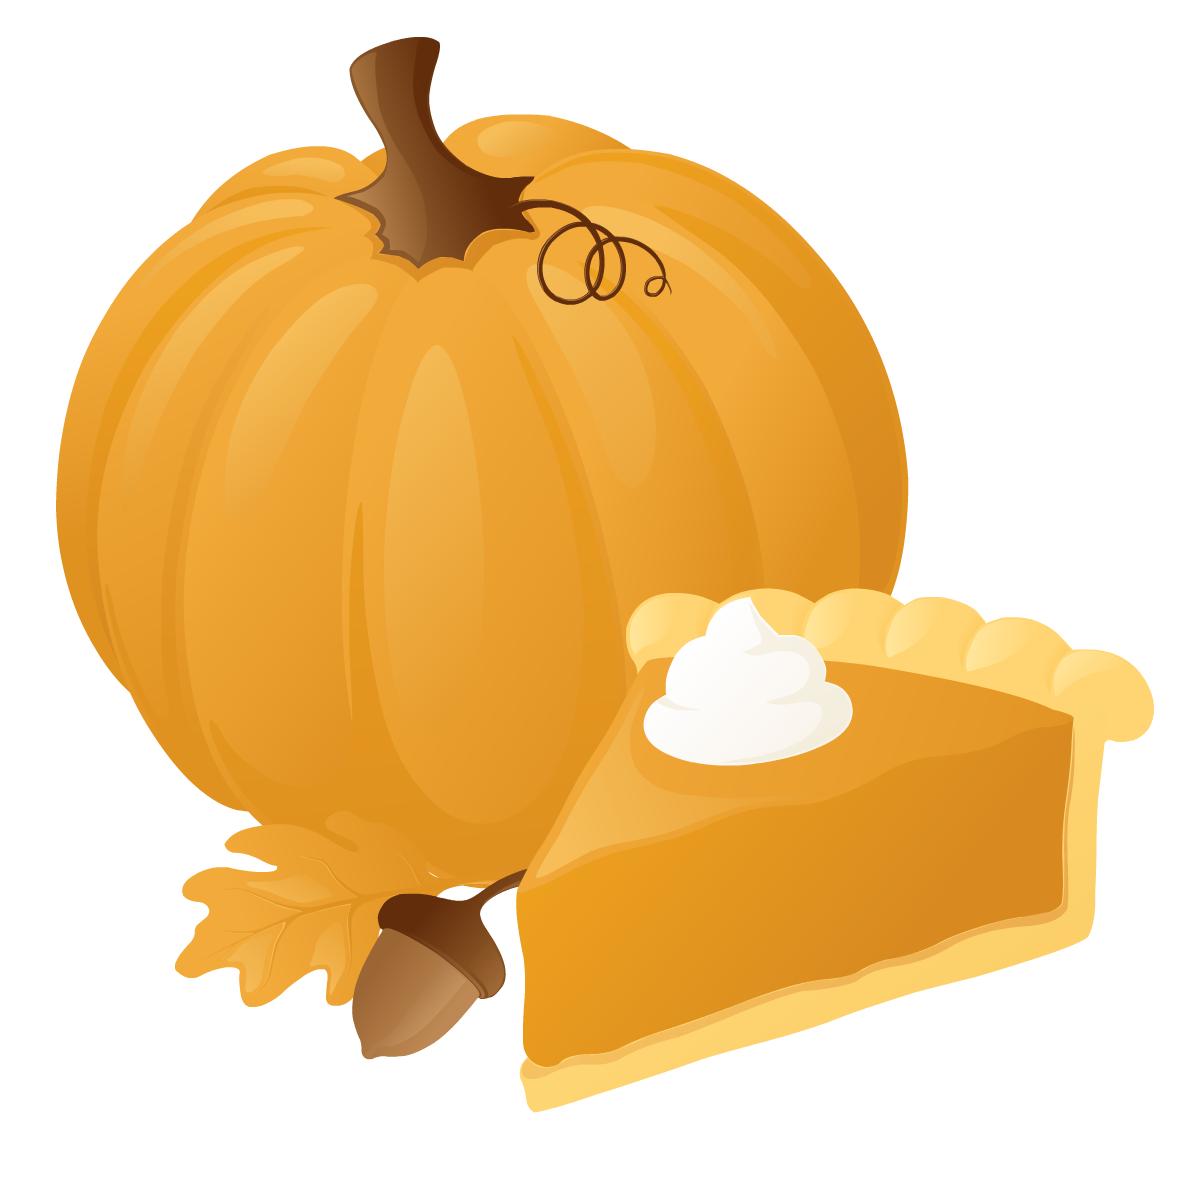 Pumpkin pie clipart 3.